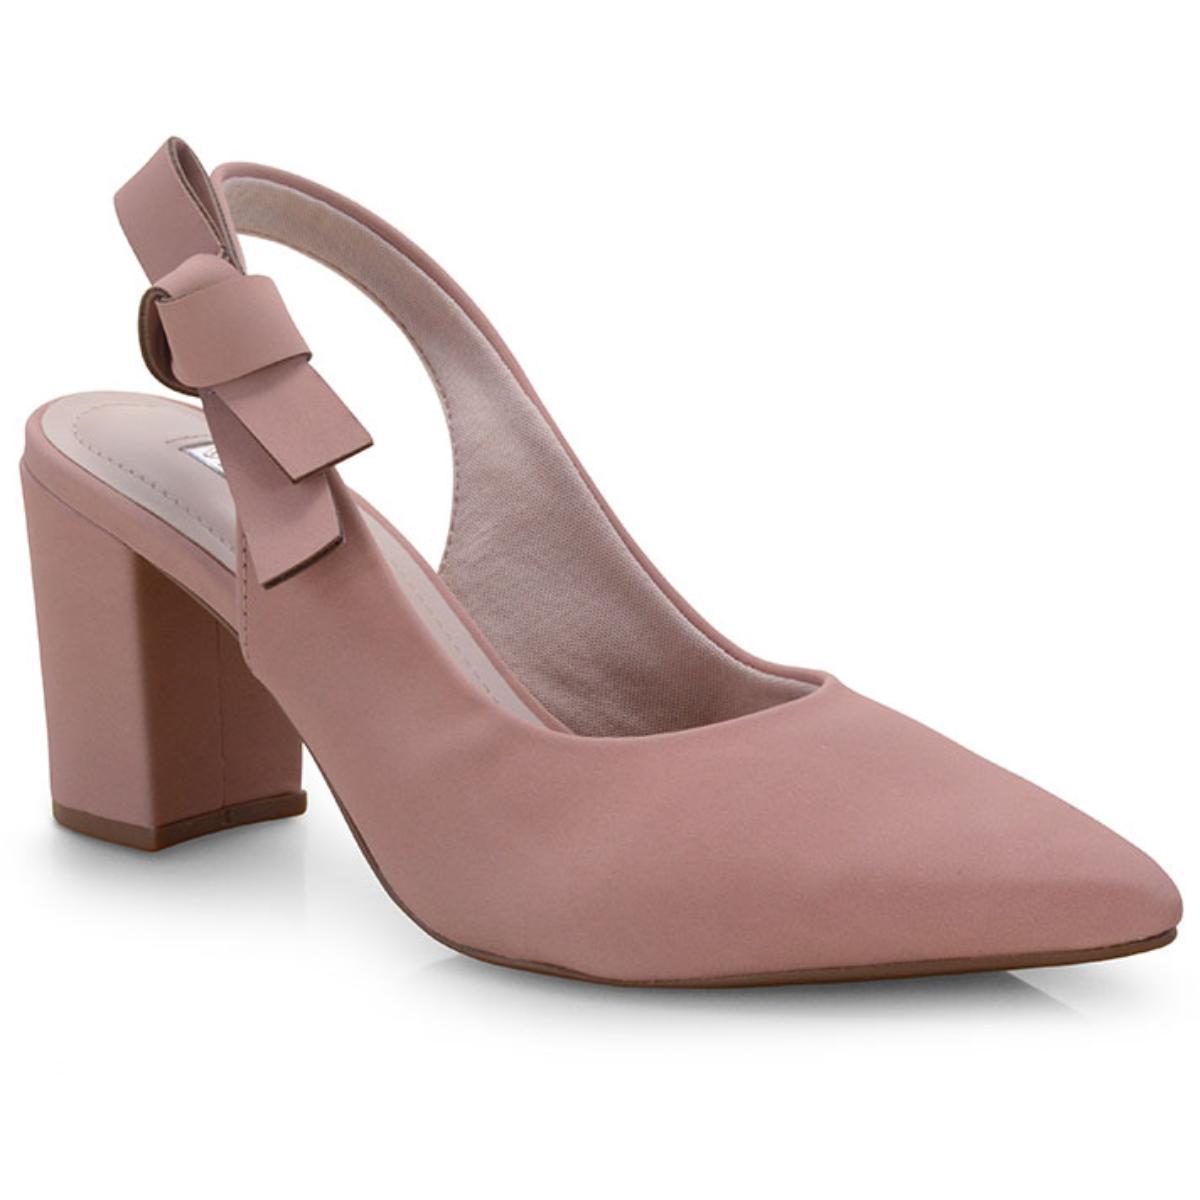 Sapato Feminino Via Marte 19-7204 Antique